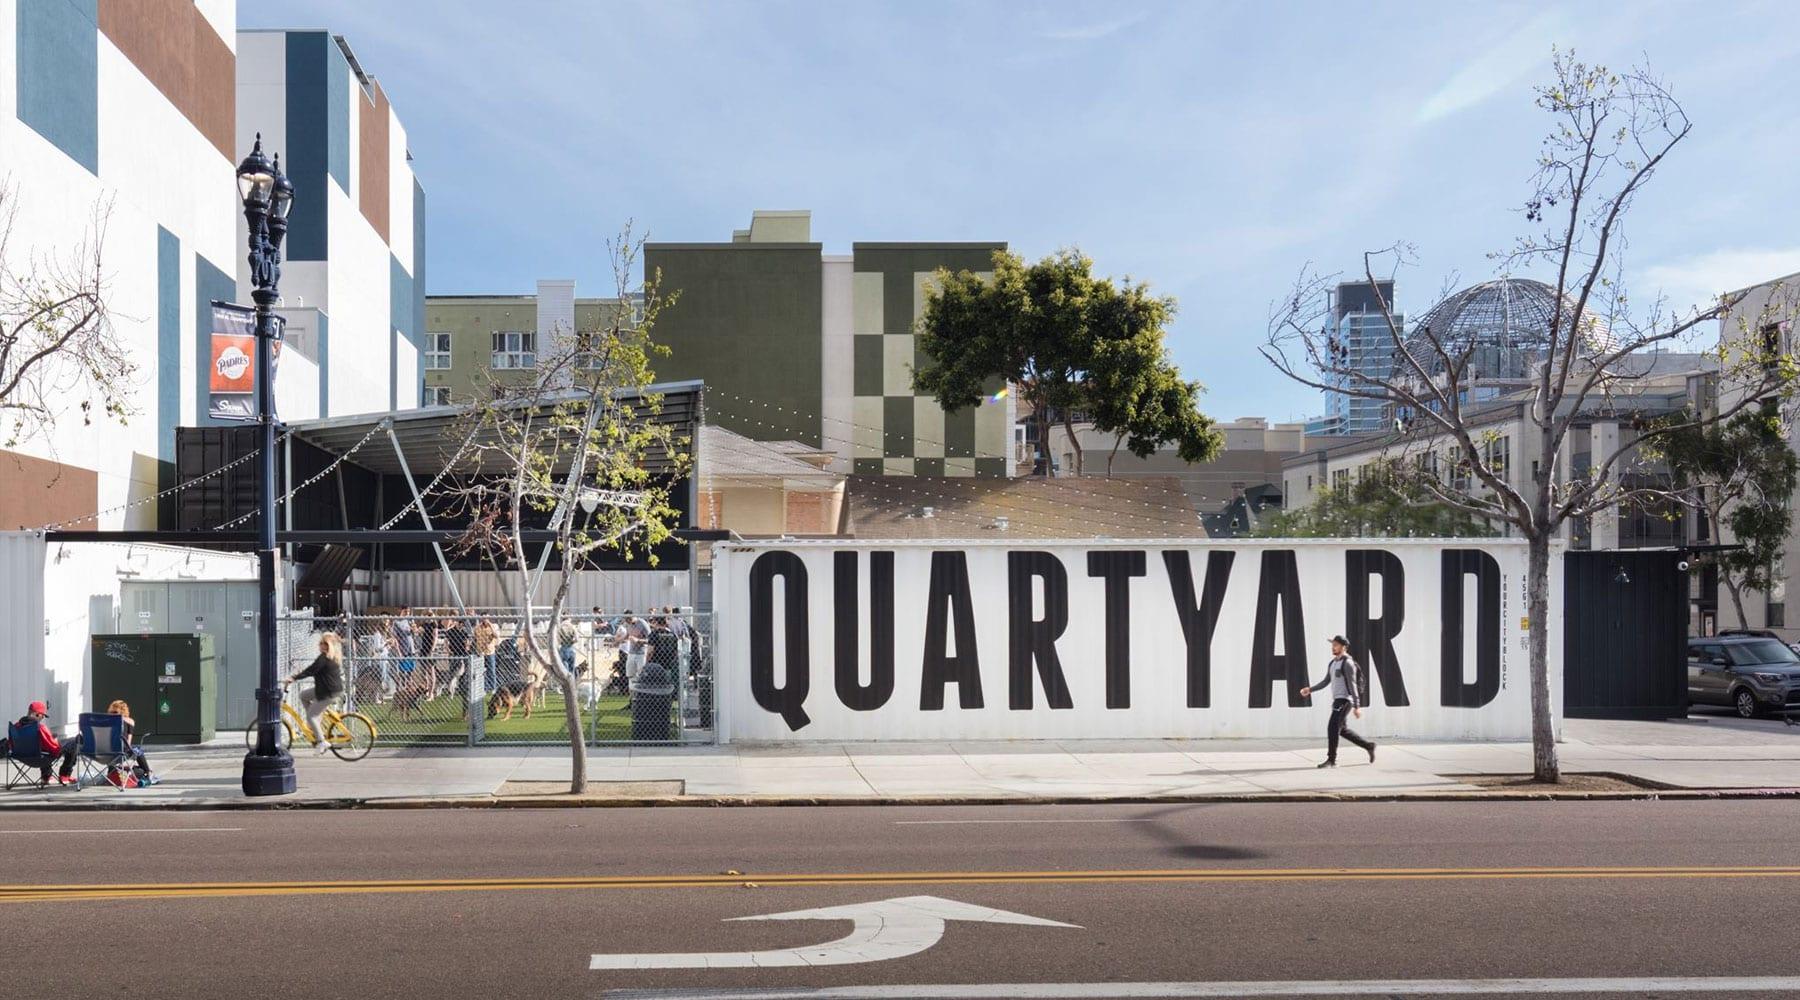 Quartyard